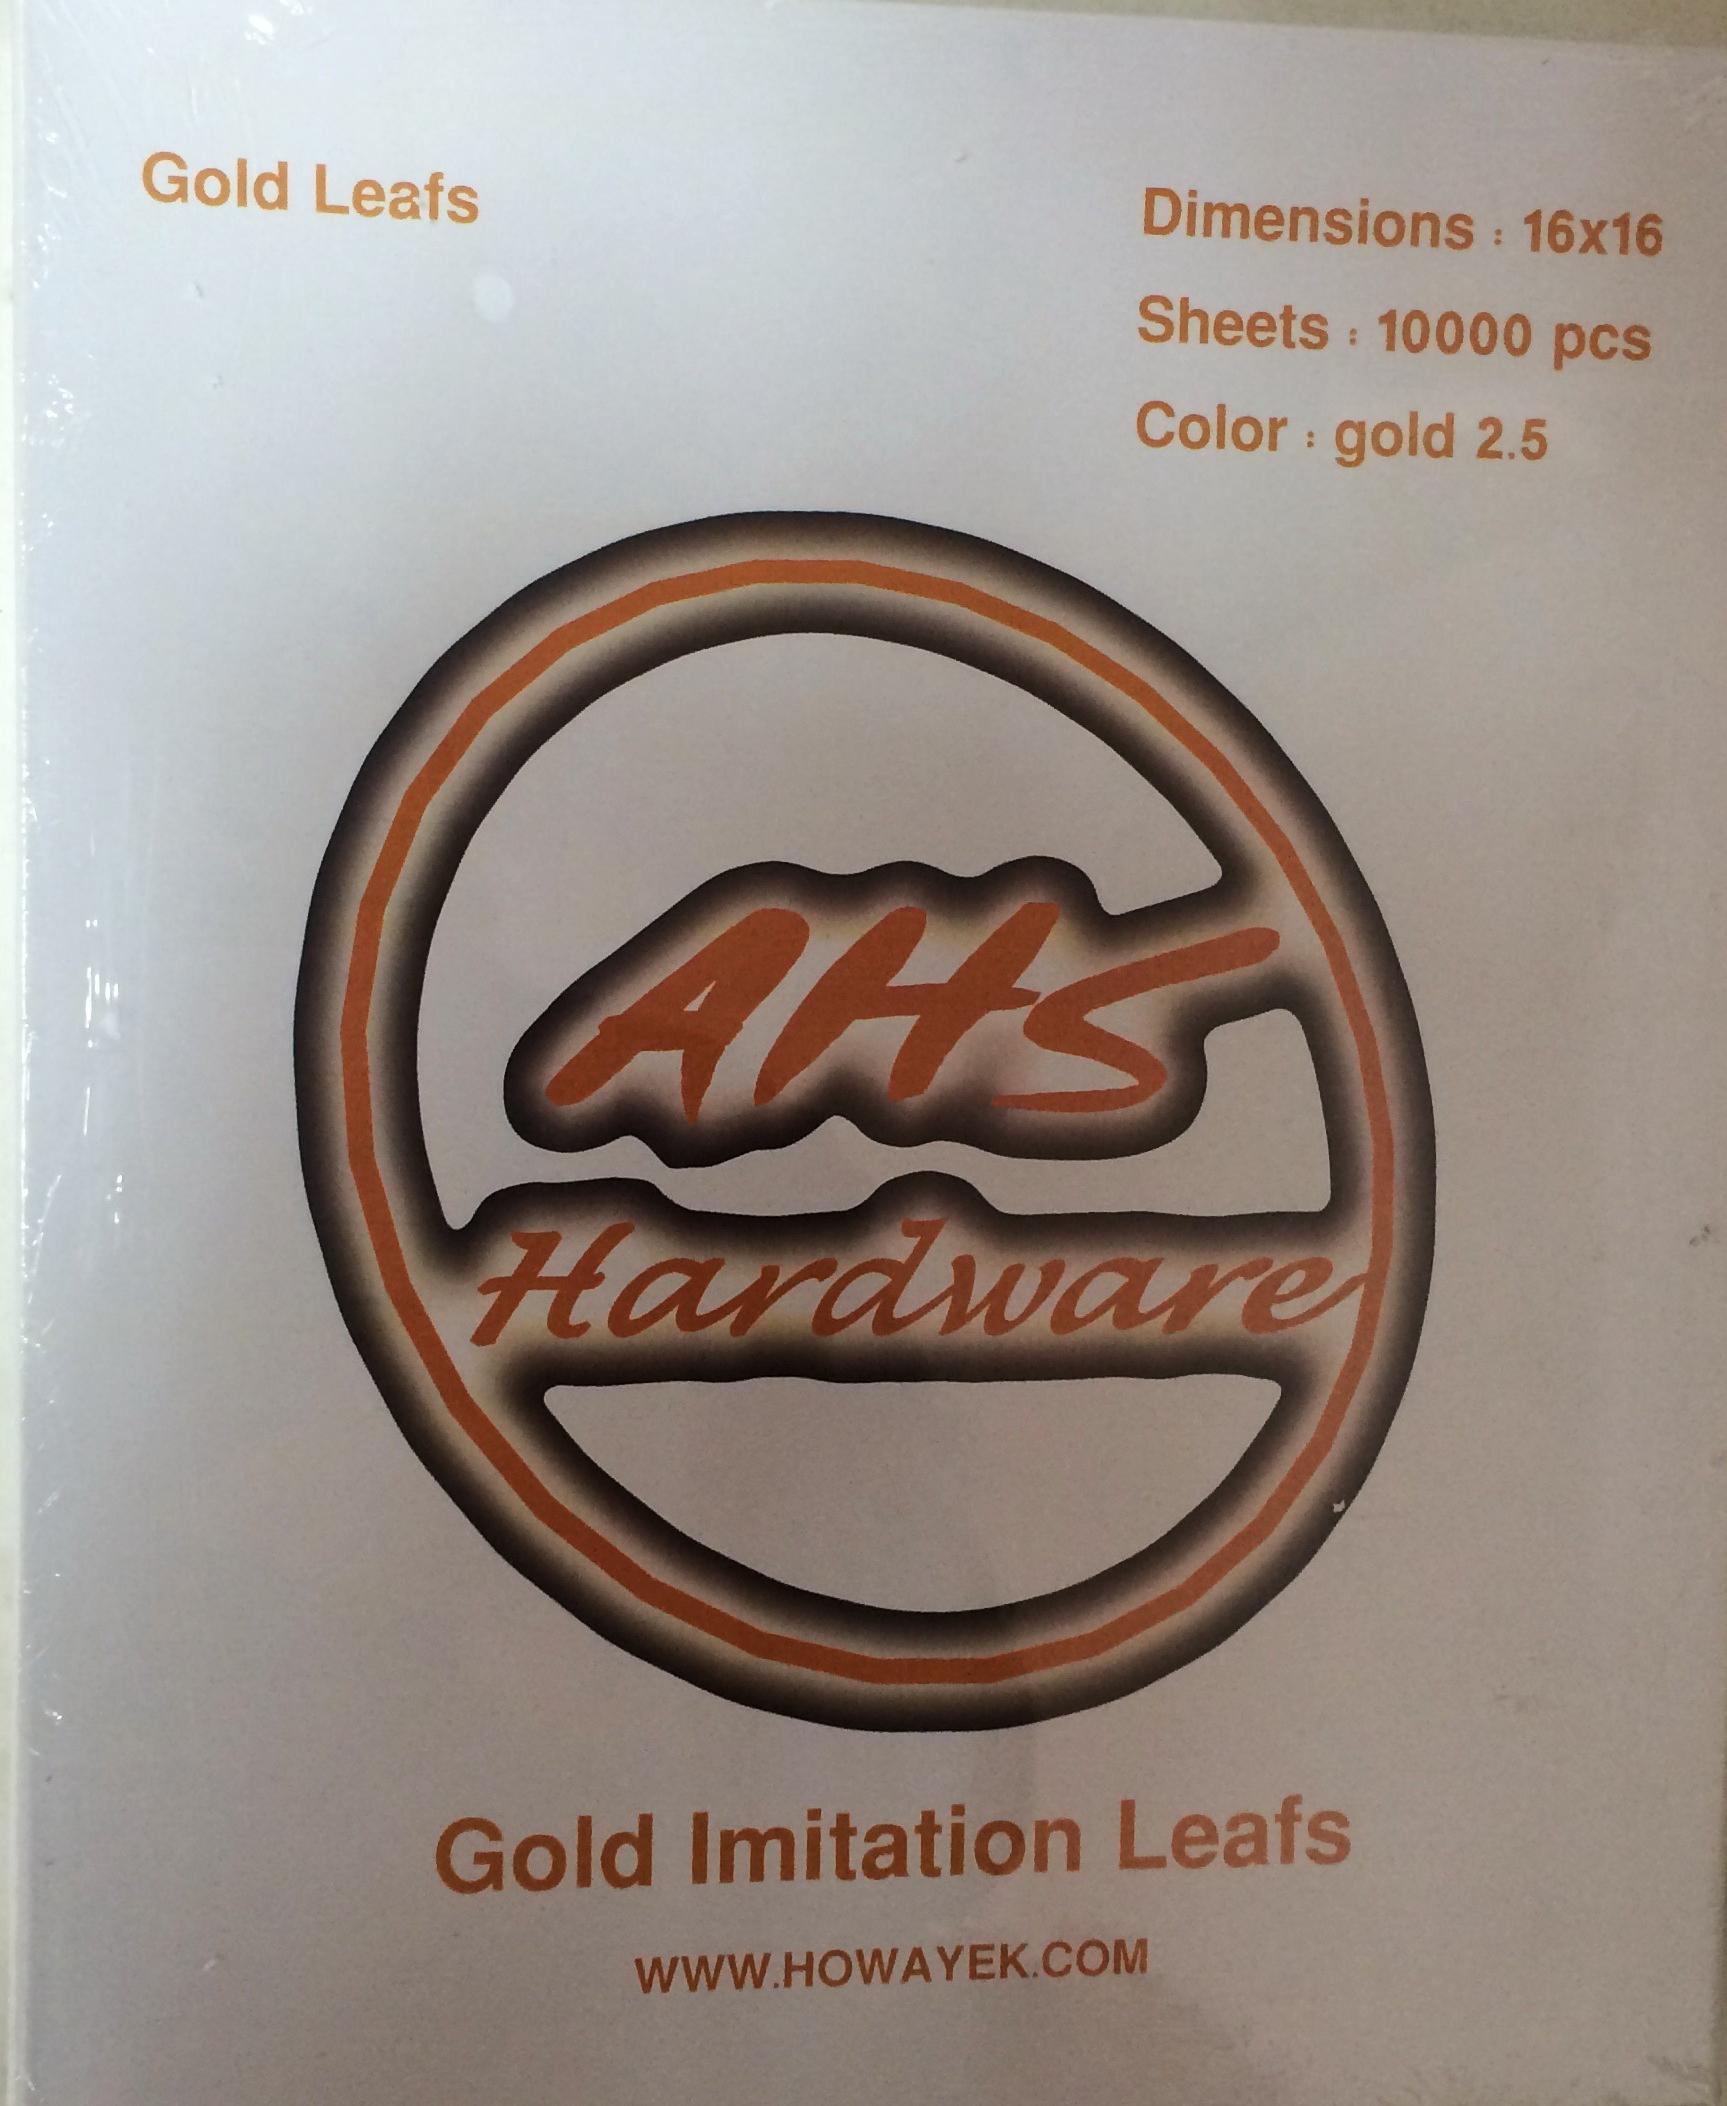 gold leafs